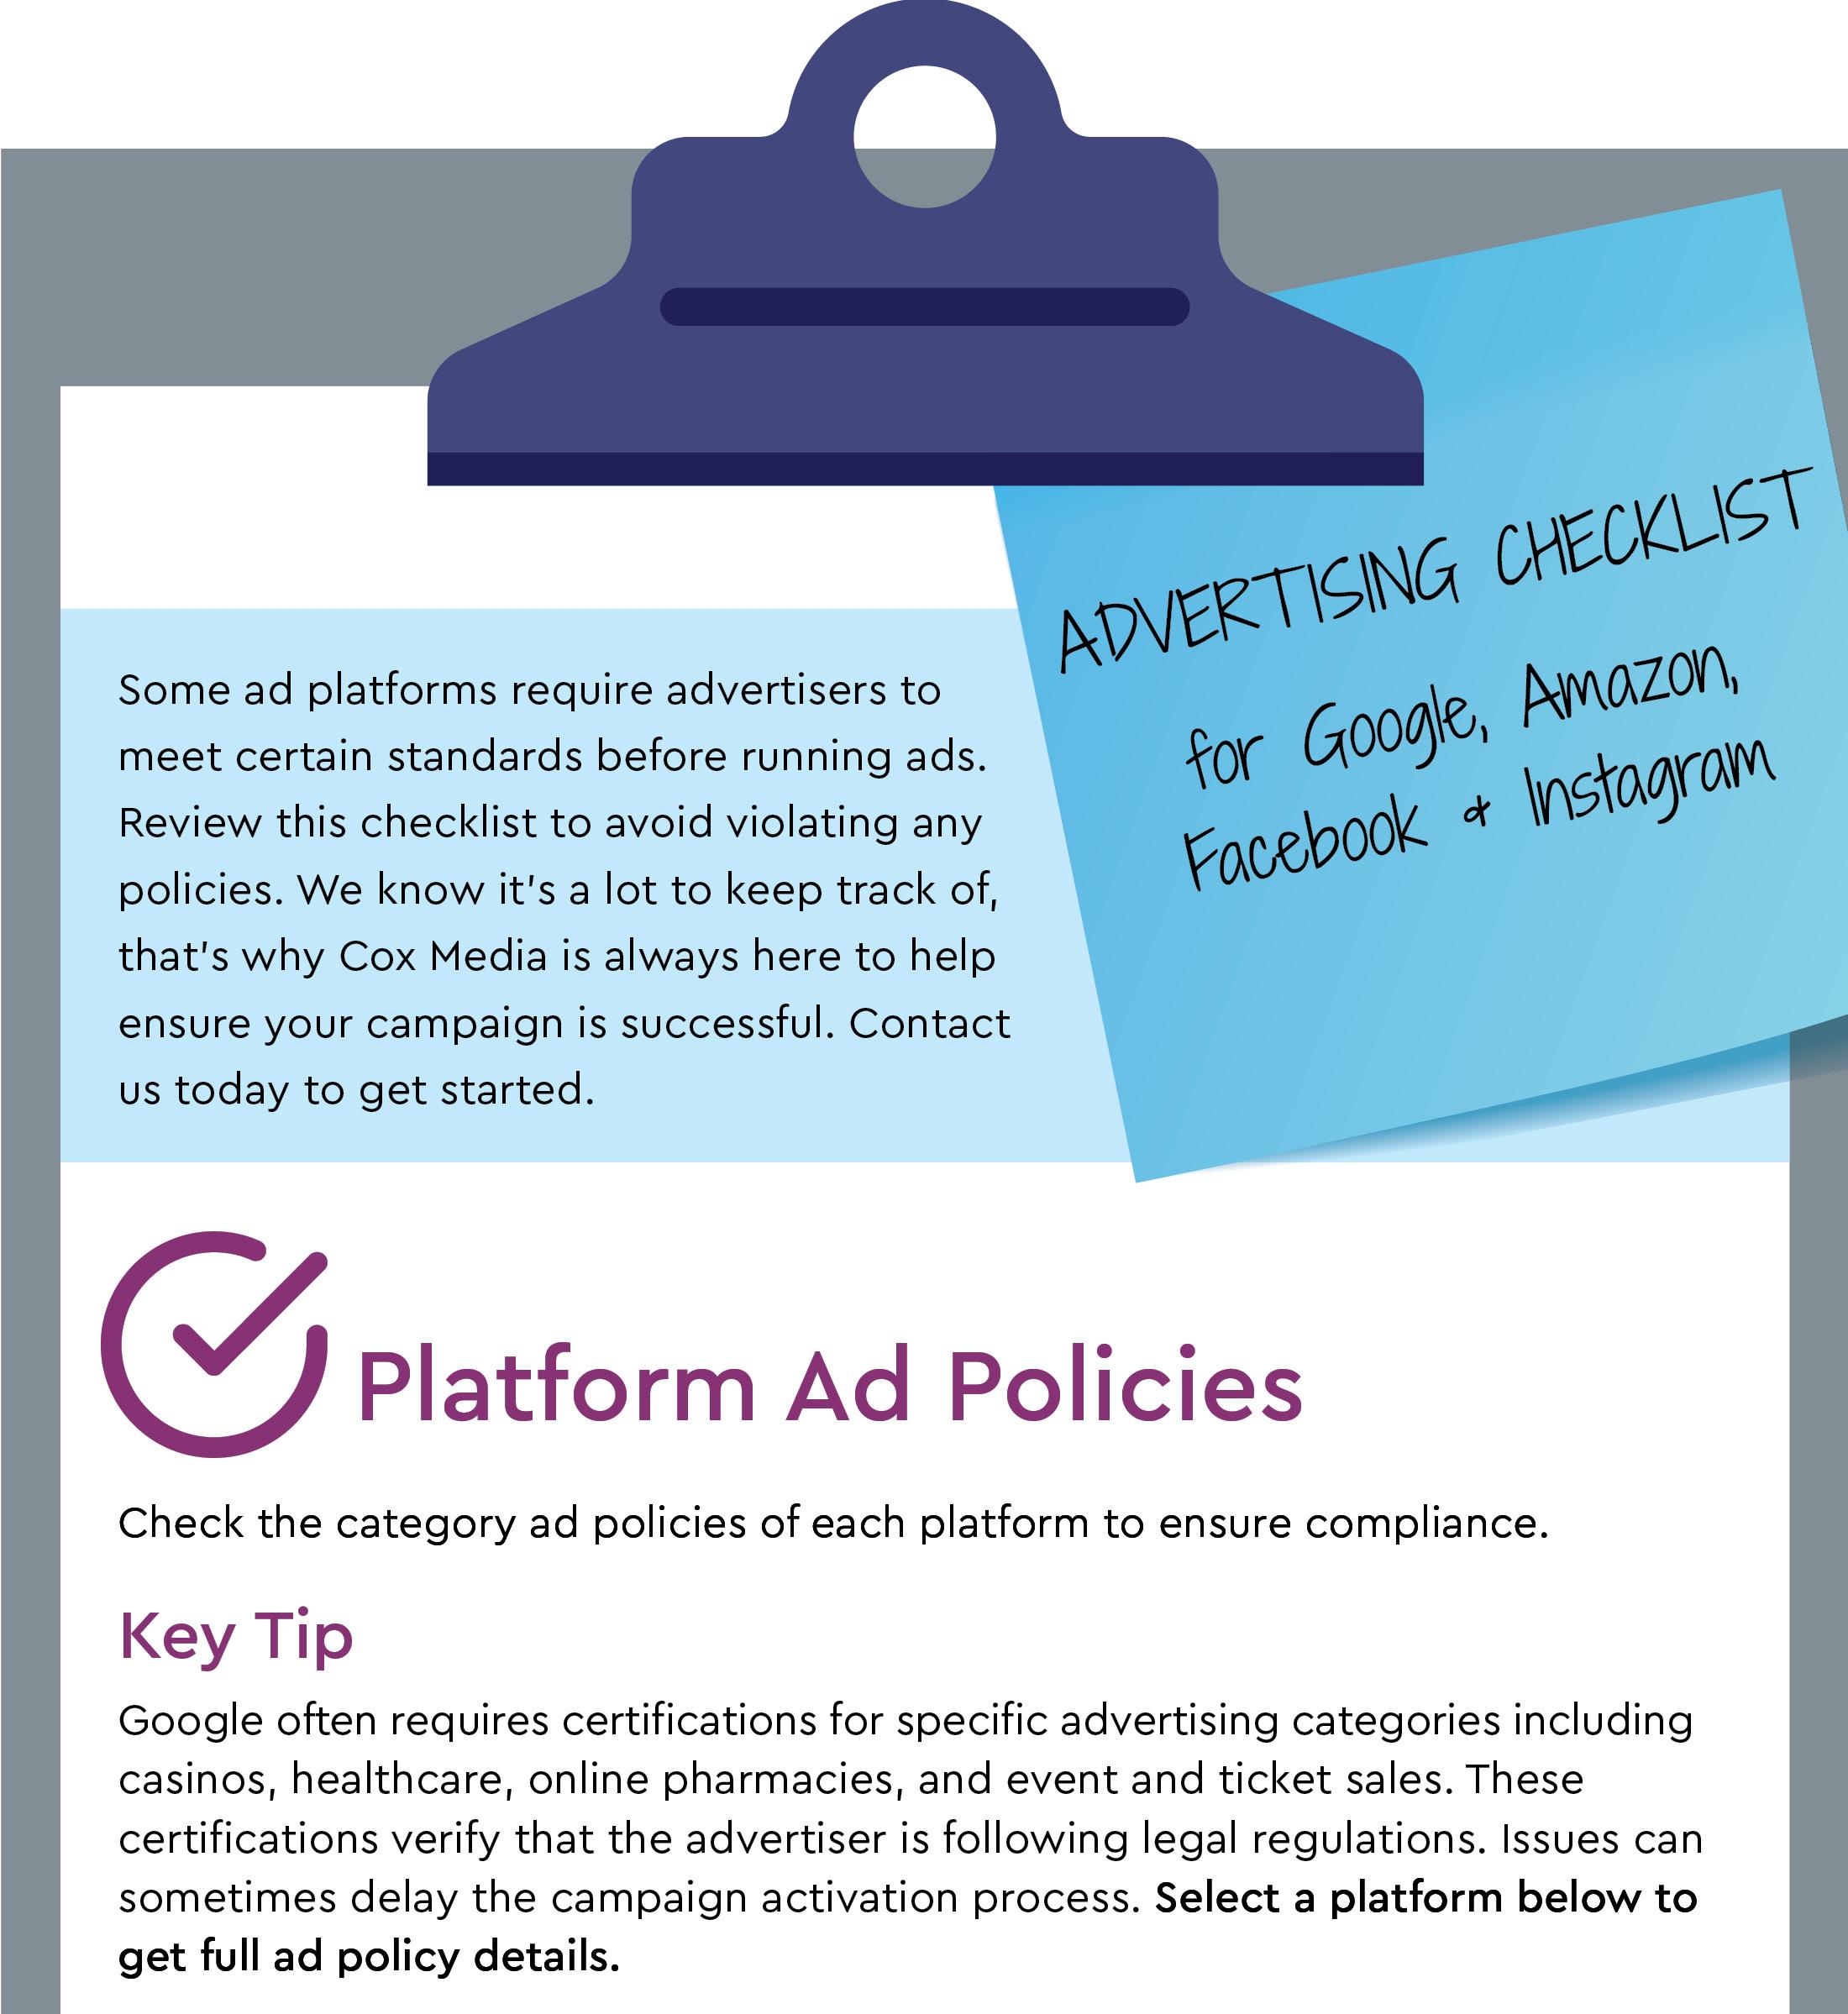 Your Advertising Checklist for Google, Amazon, Facebook & Instagram